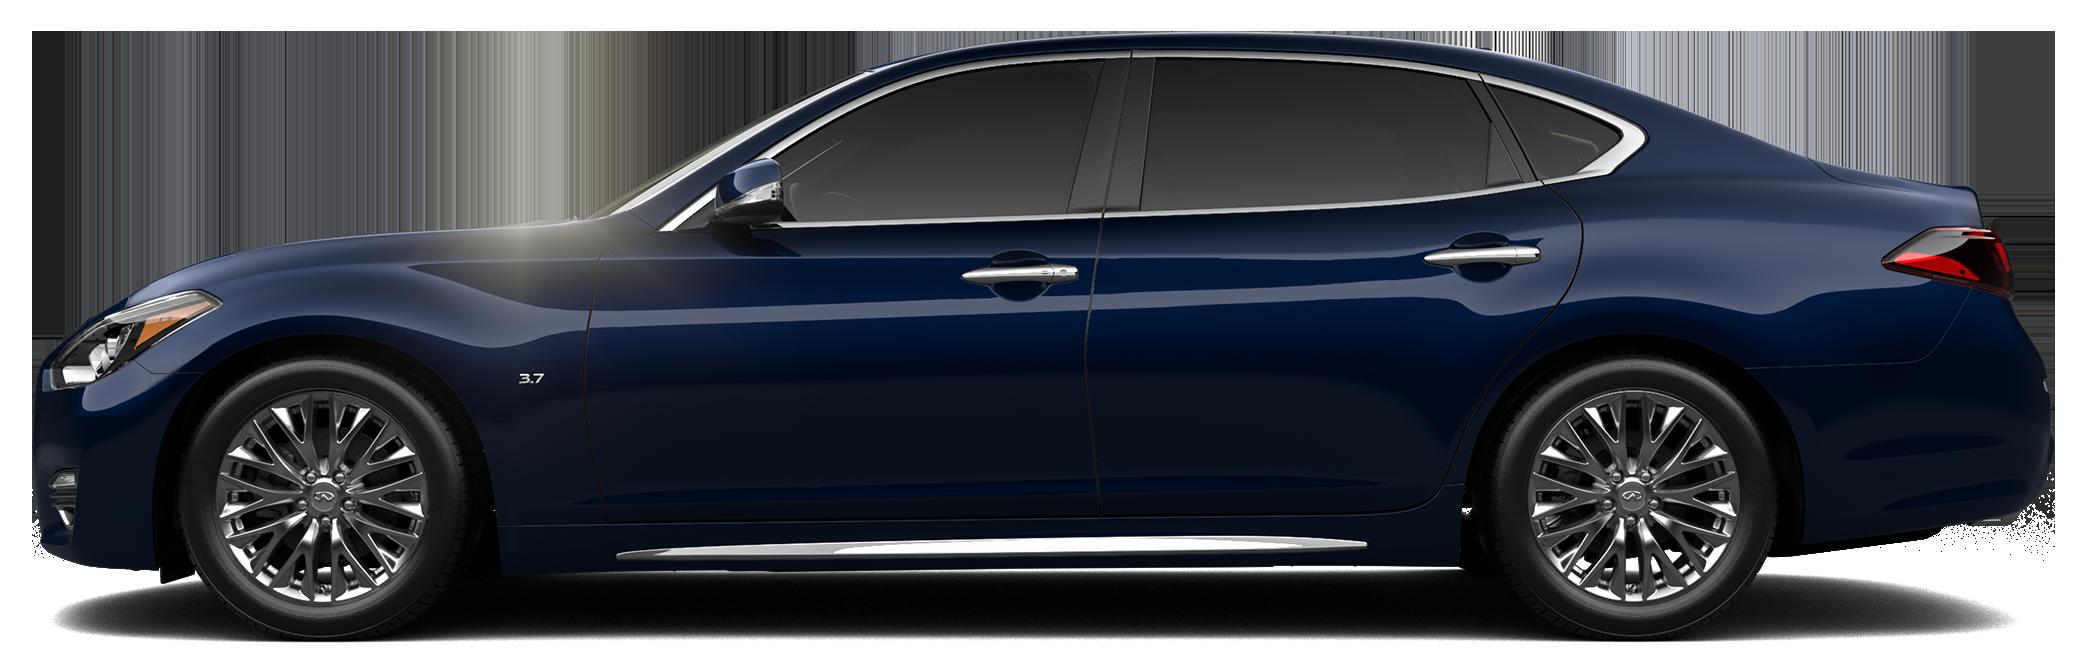 2019 INFINITI Q70L Sedan 3.7 LUXE